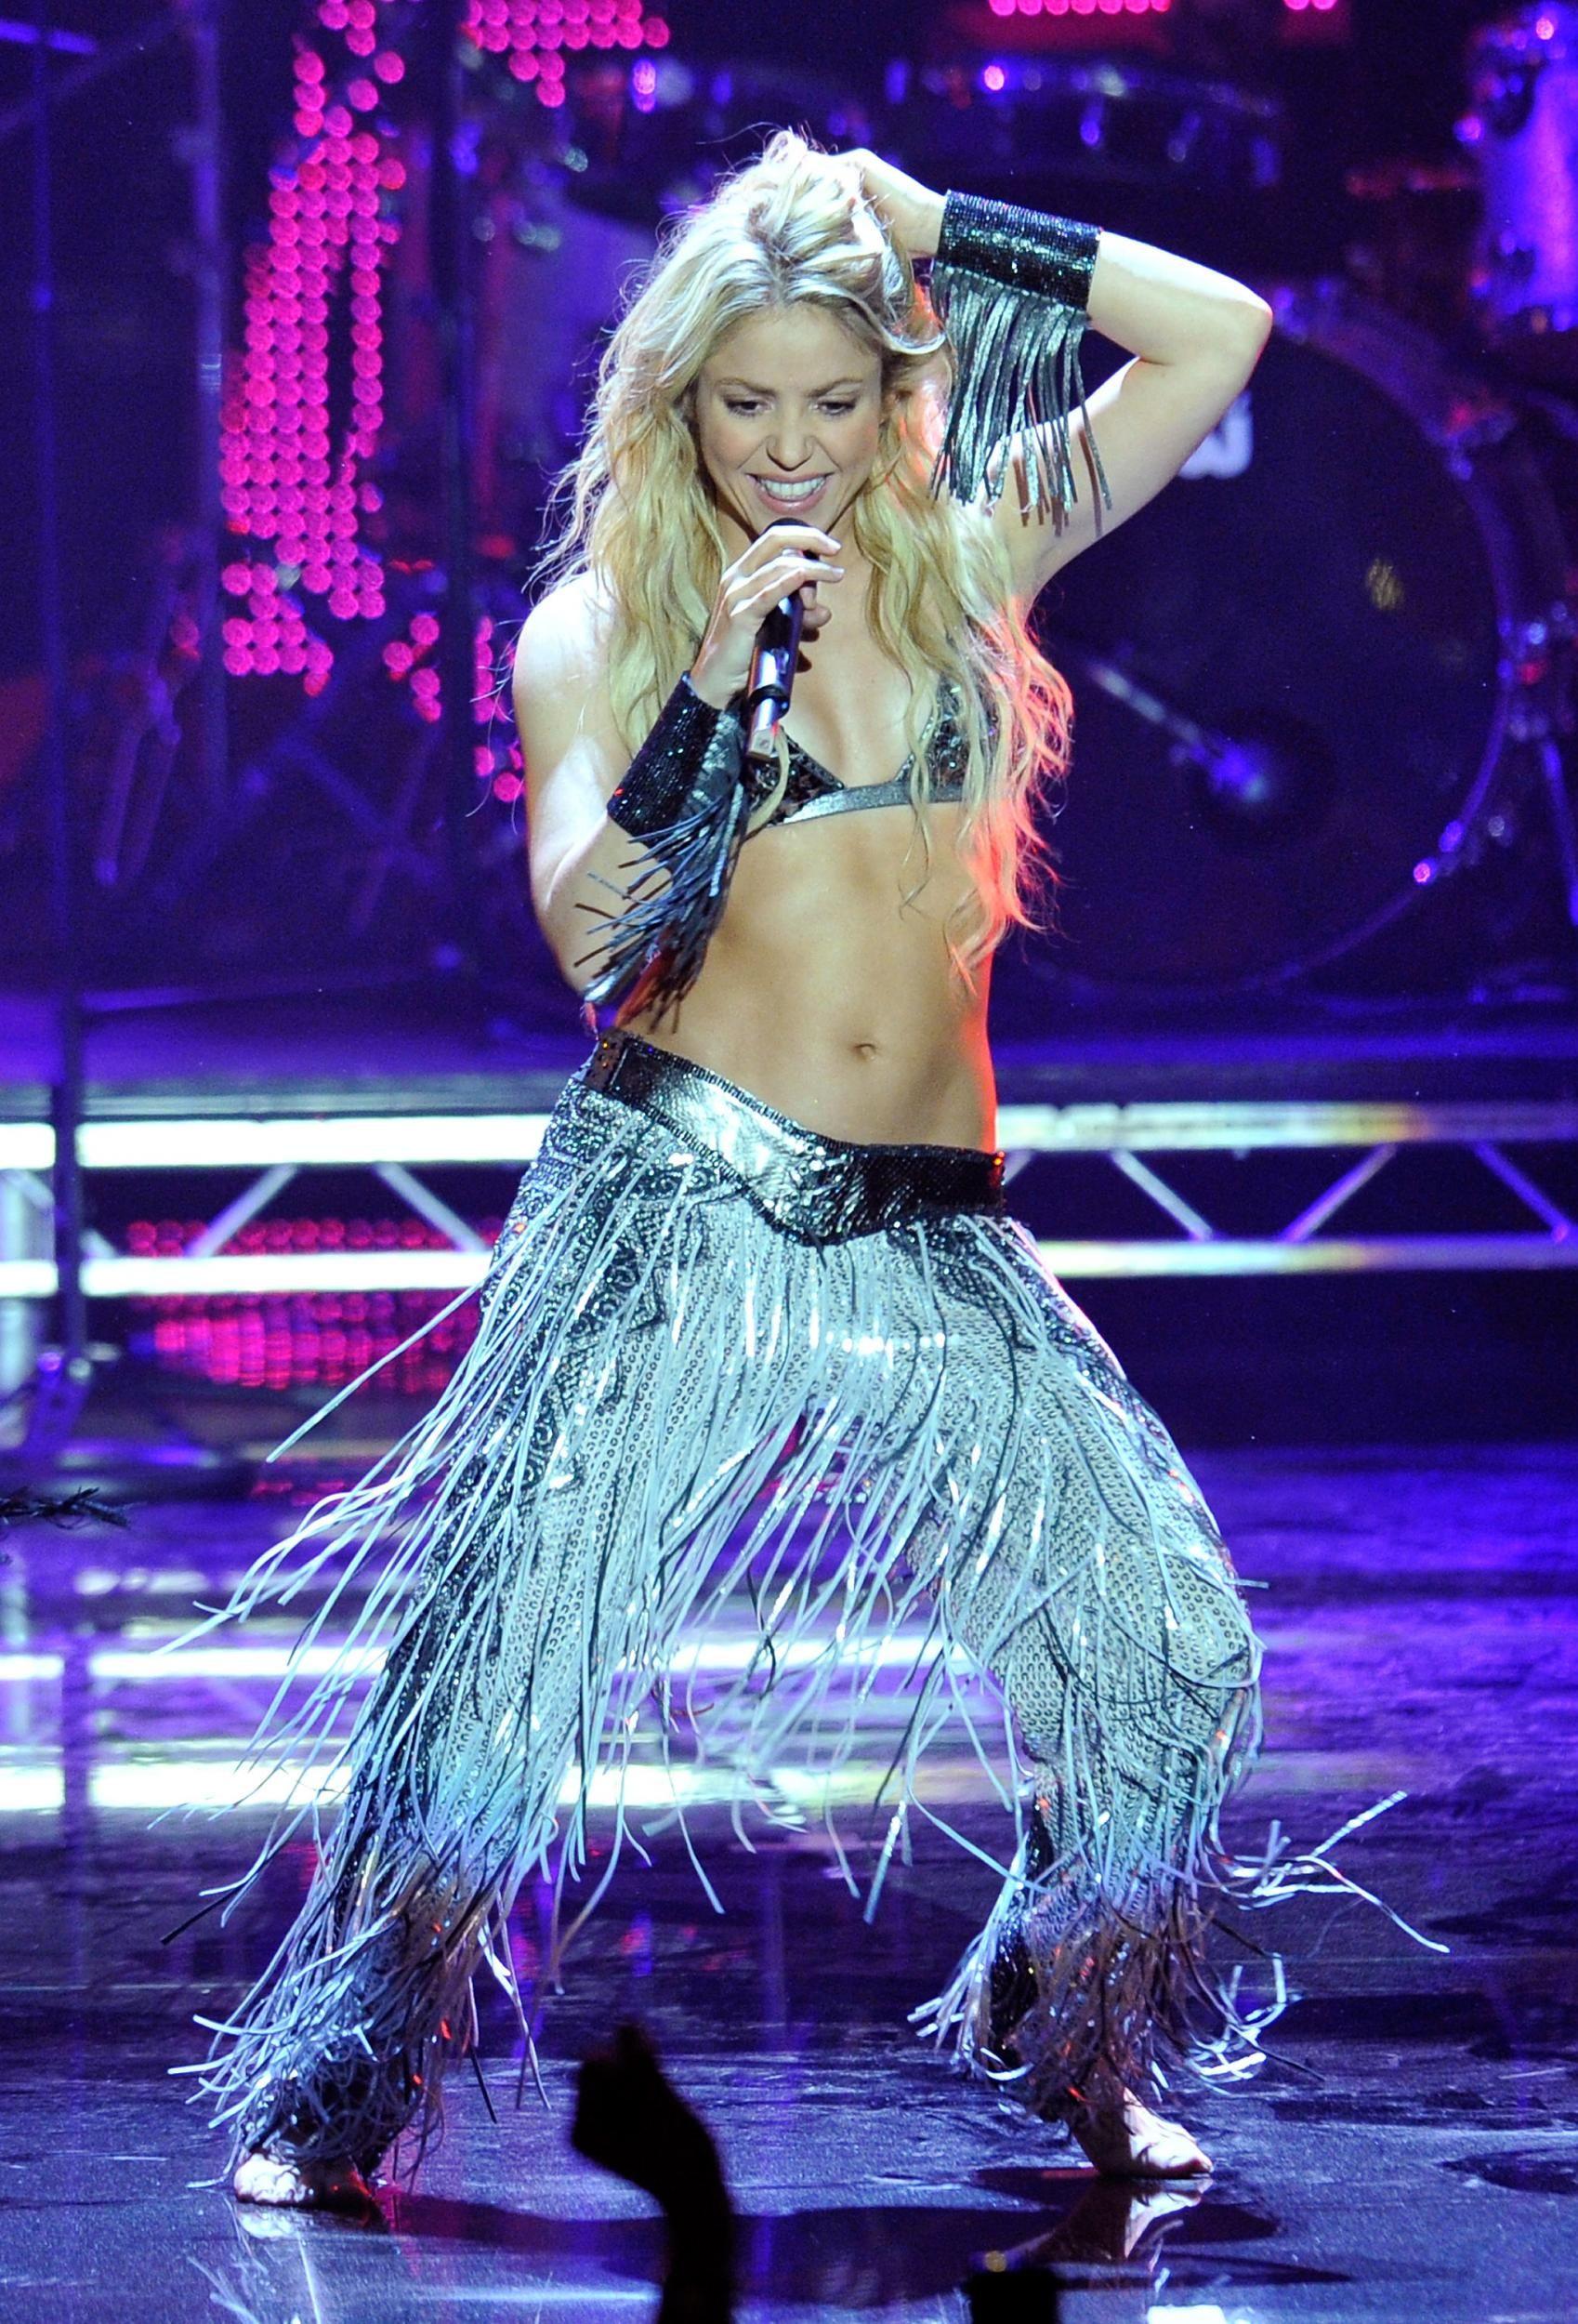 Masih Kencang, Intip Gaya Seksi Shakira Kalau Di Atas Panggung!